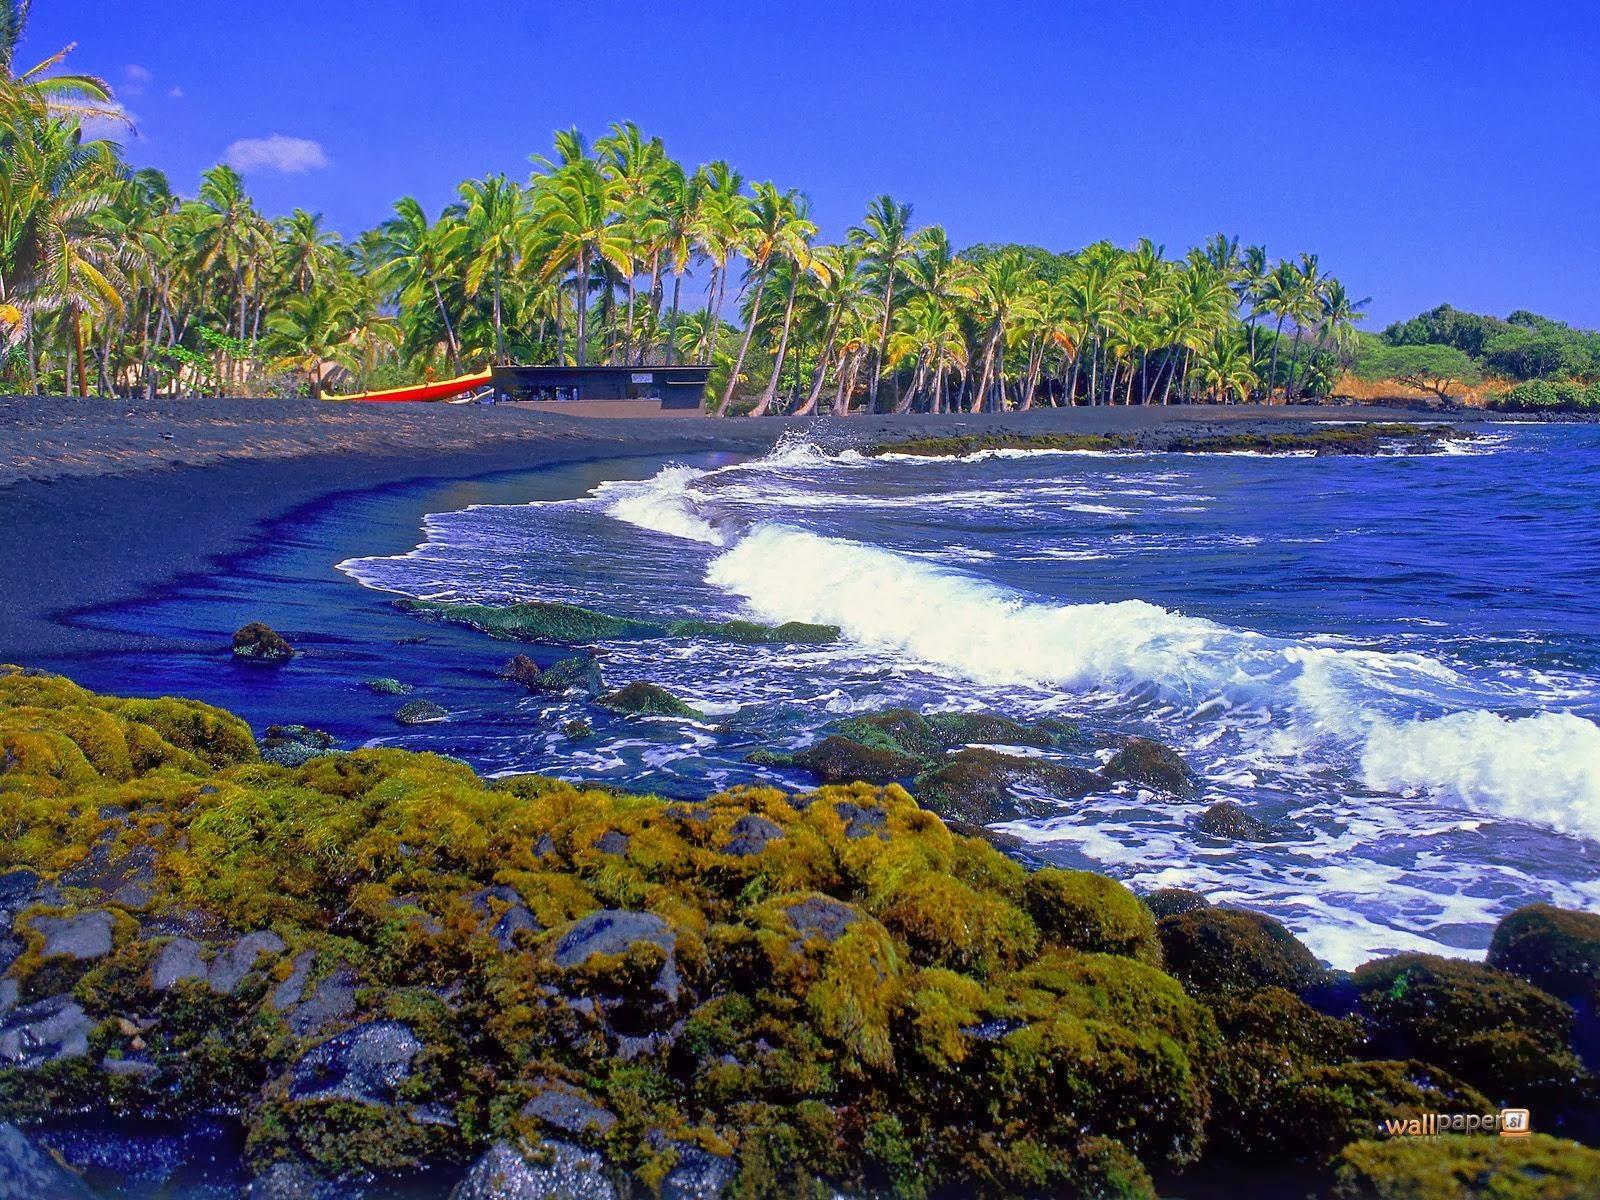 hawaiian island view wallpapers wallpaper view